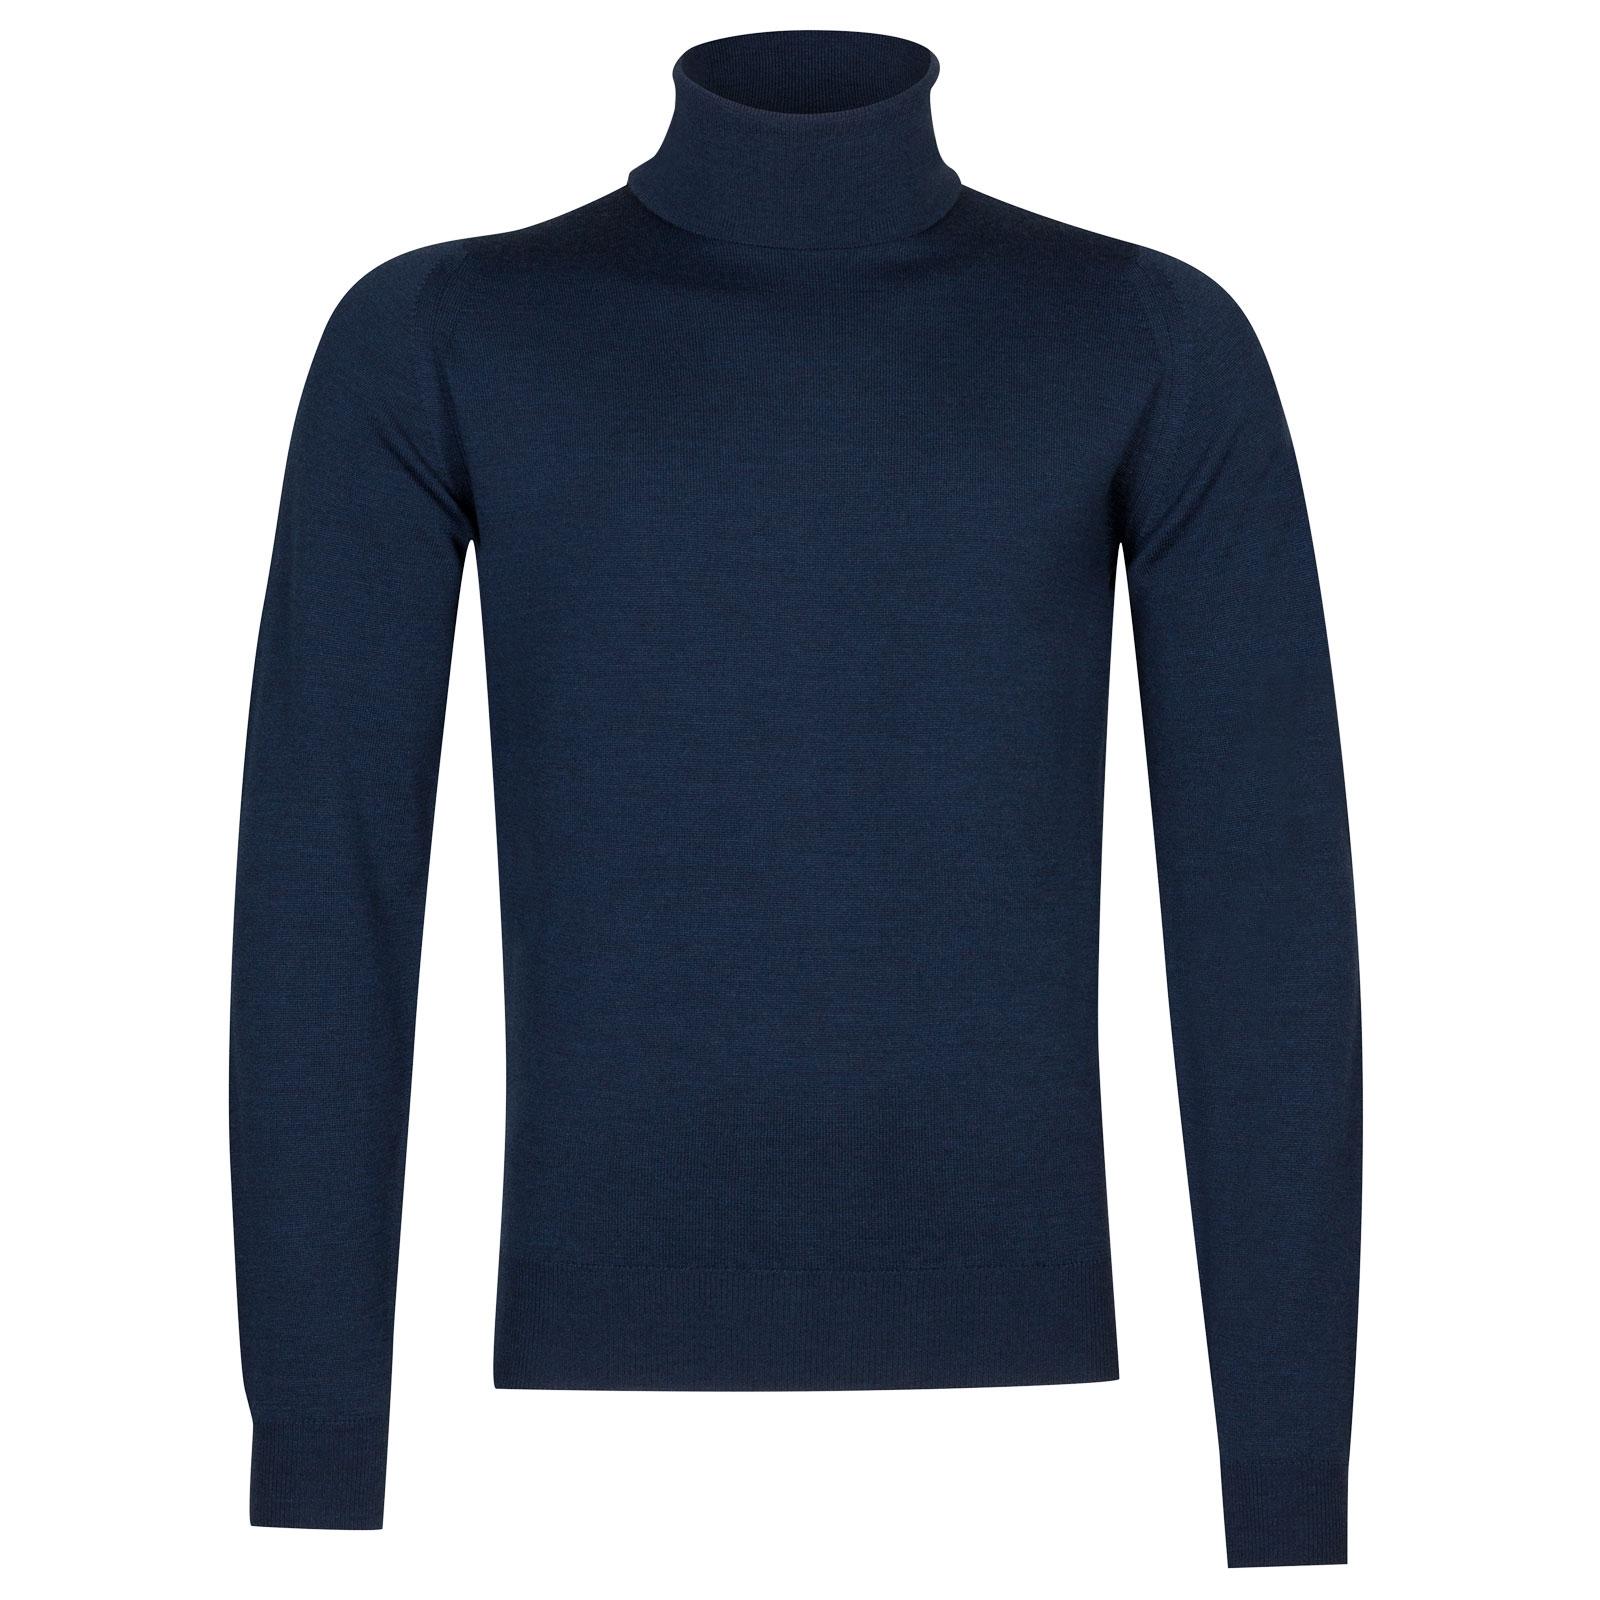 John Smedley Connell Merino Wool Pullover in Indigo-M